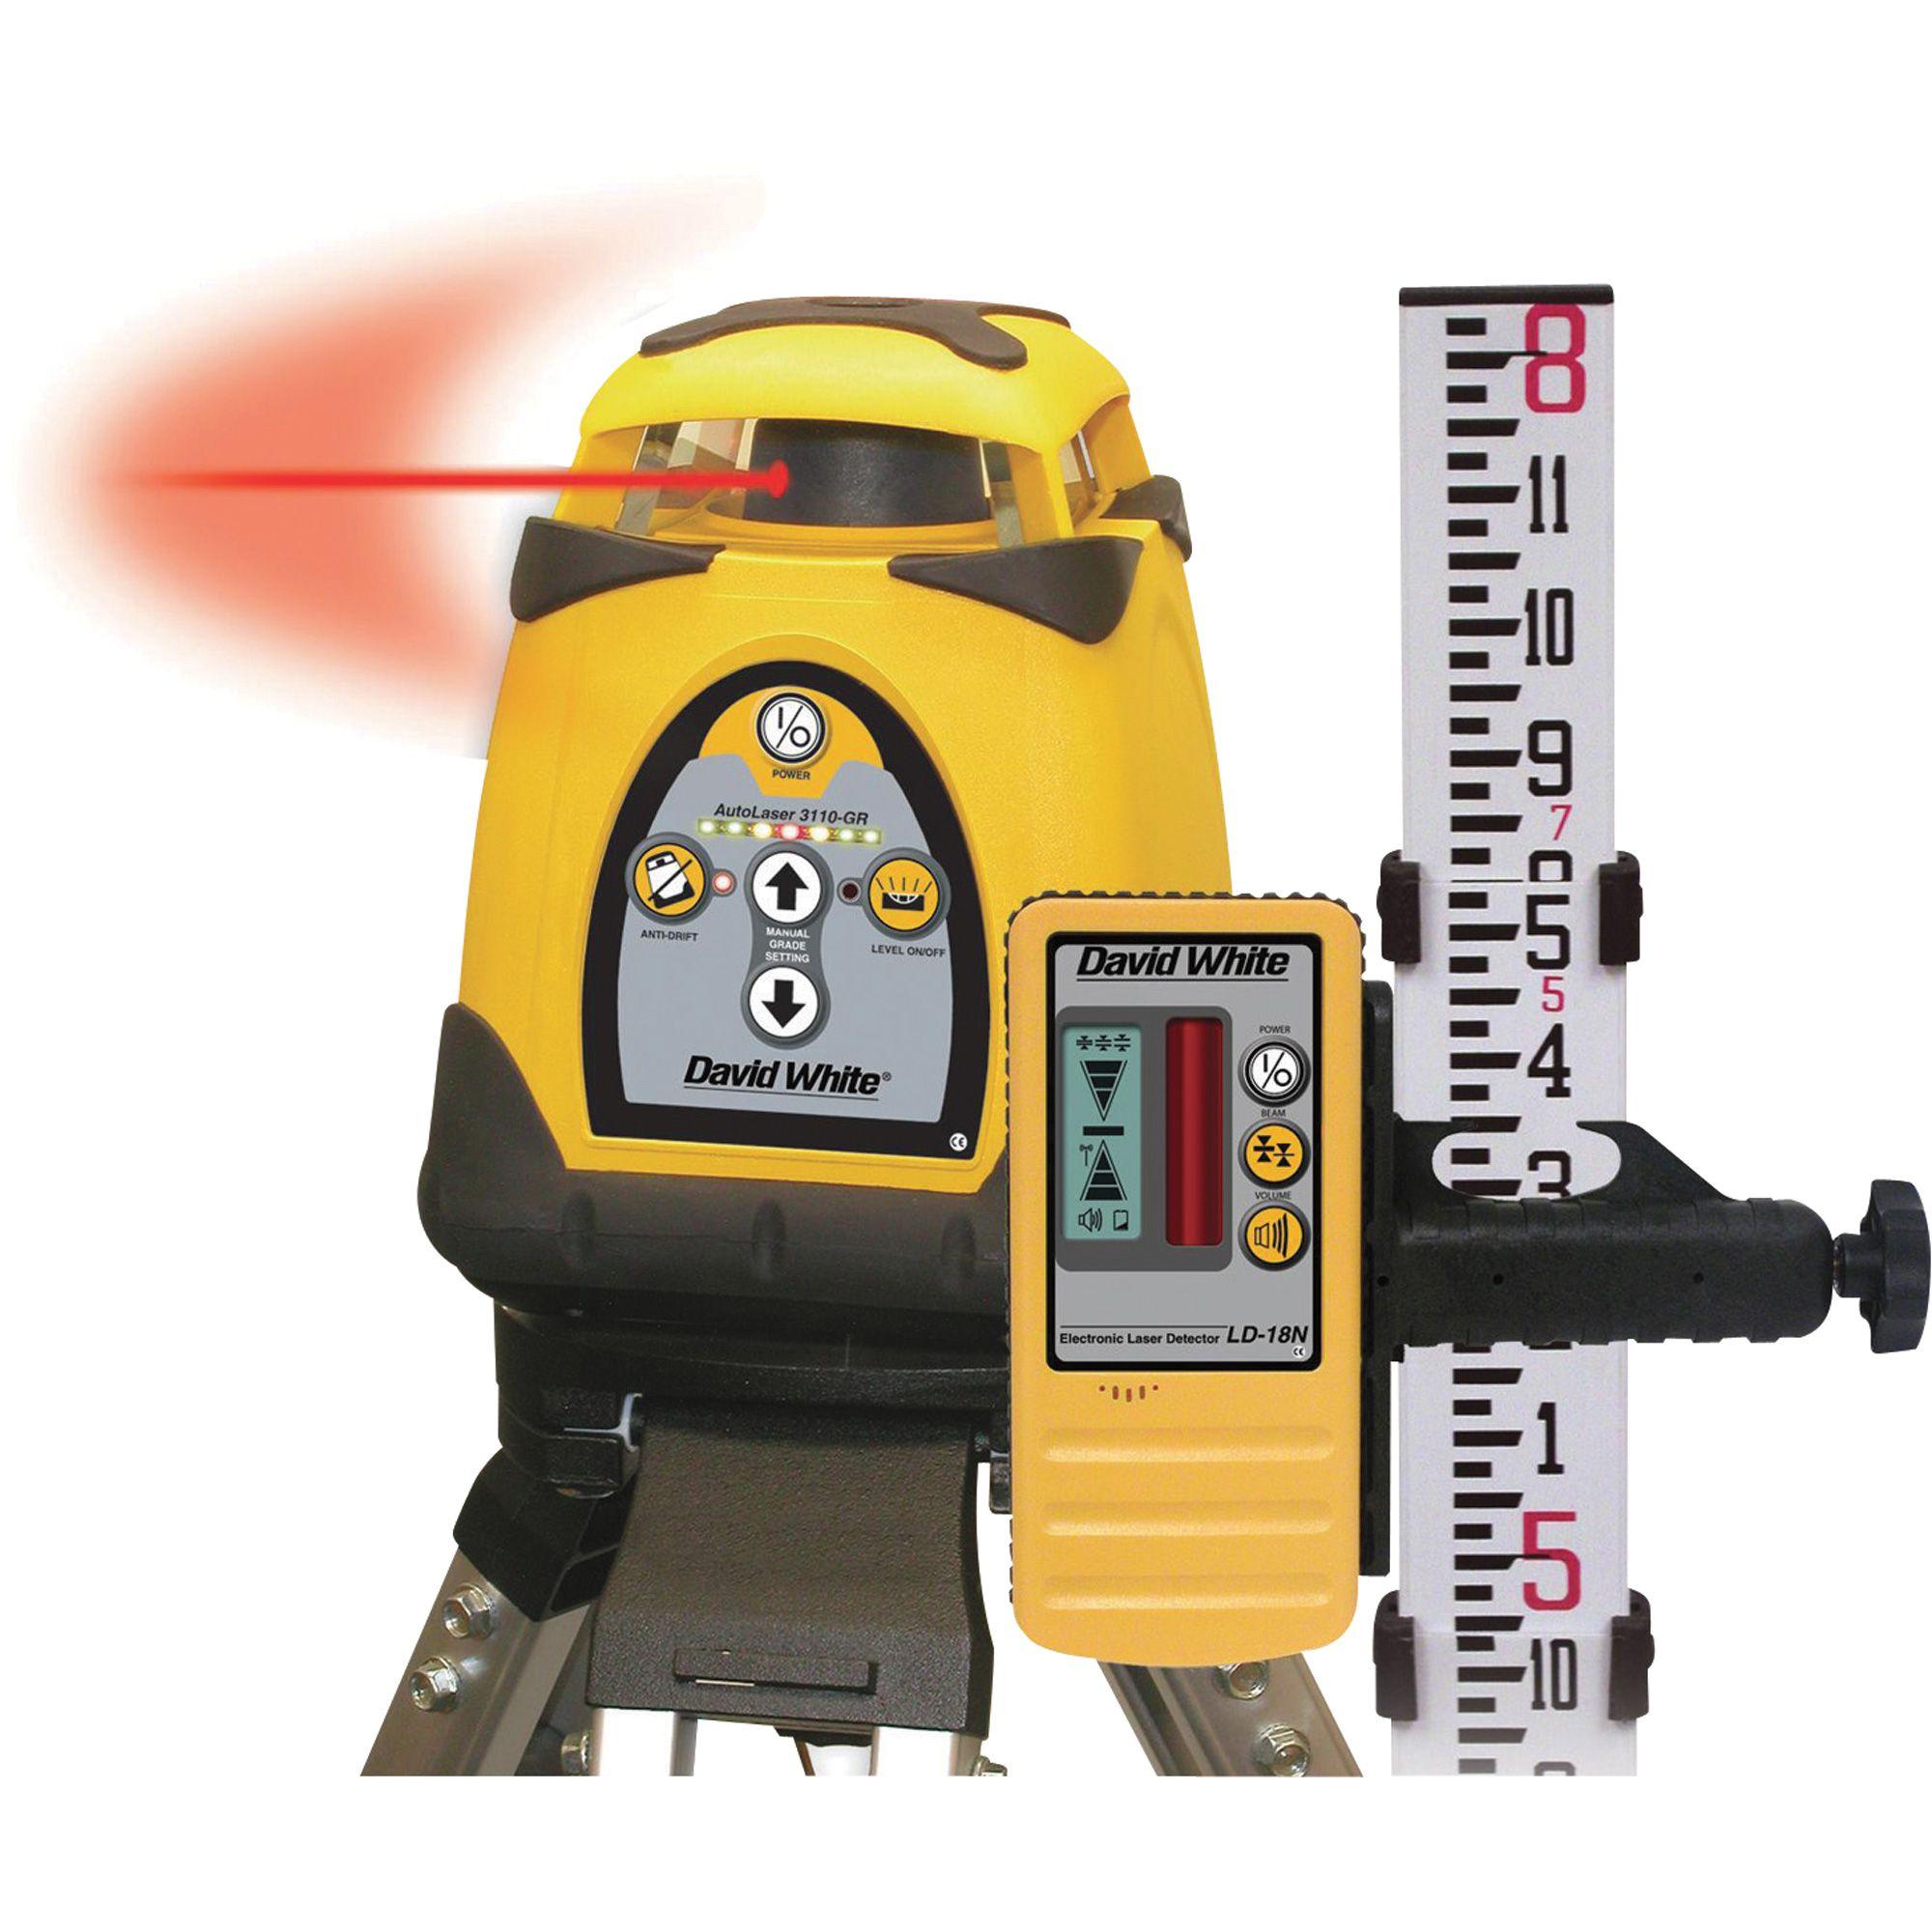 Laser Level Laser Levels Stud Finders Rotary